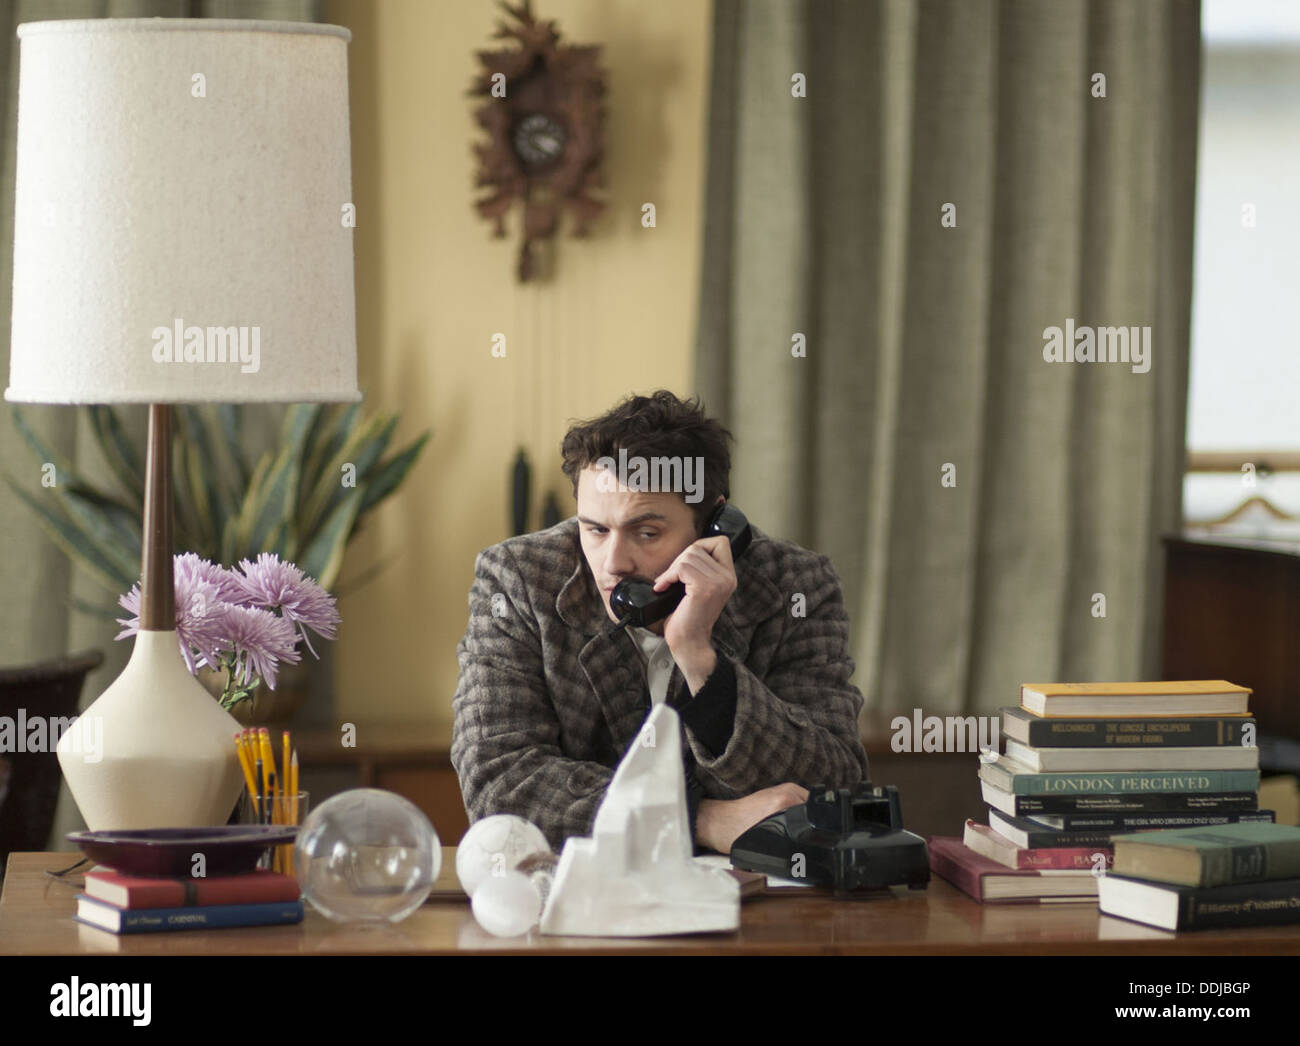 MALADIES (2012) JAMES FRANCO CARTER (DIR) 001 MOVIESTORE COLLECTION LTD - Stock Image